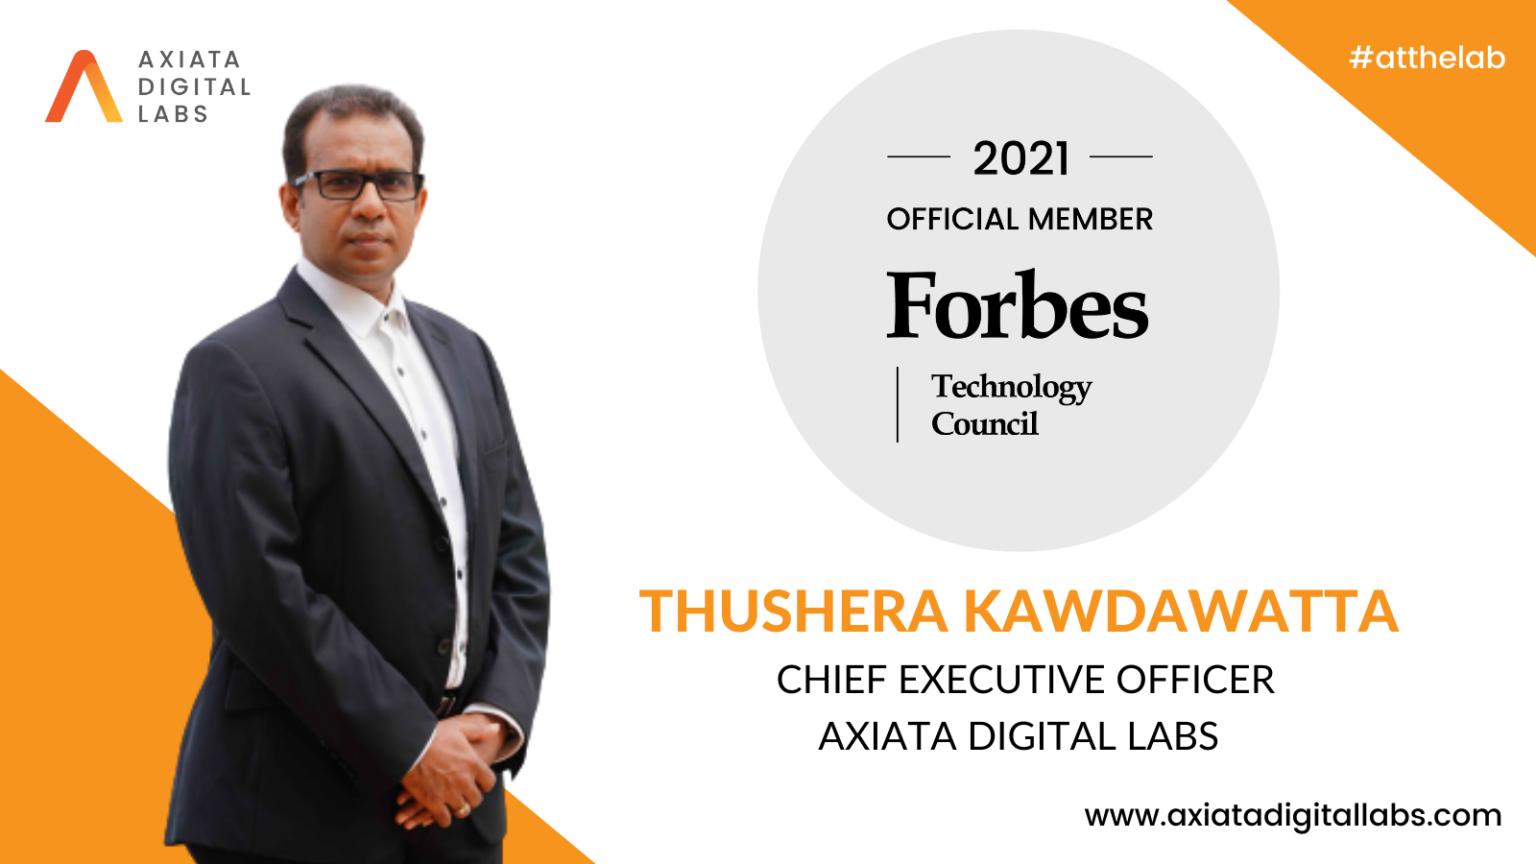 ADL CEO Thushera Kawdawatta Forbes Technology Council